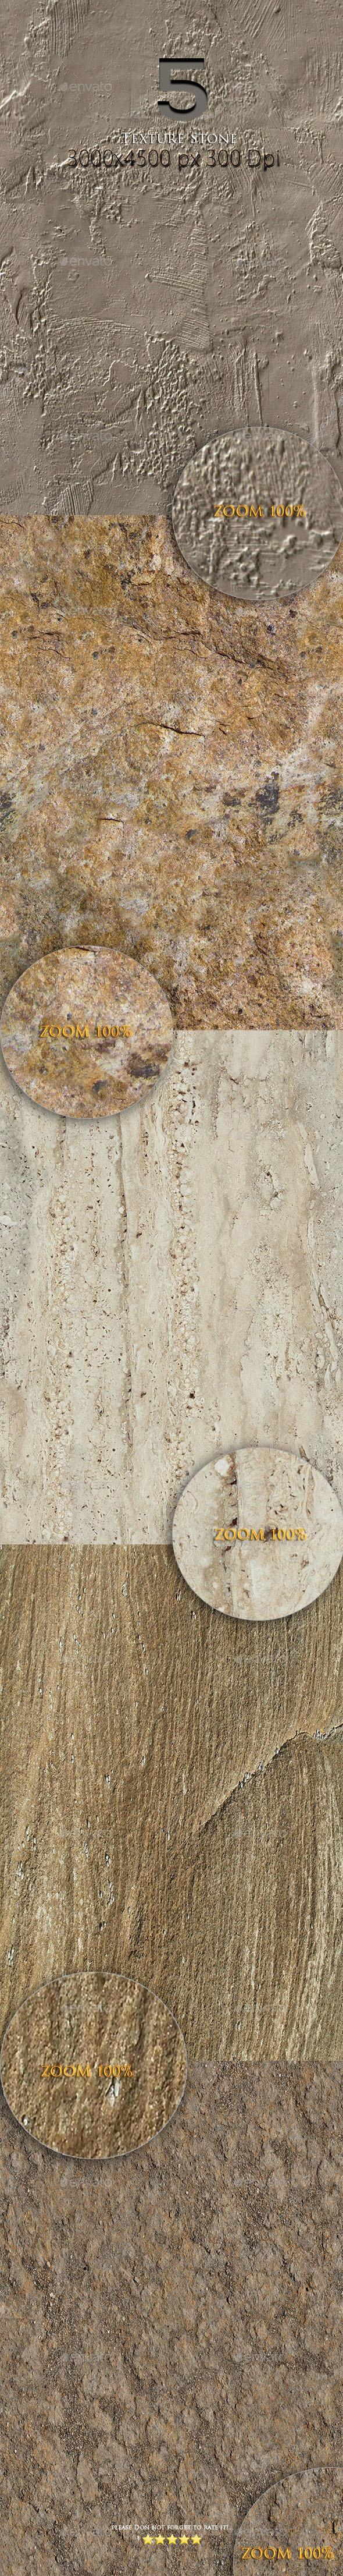 5 Texture Stone - Stone Textures